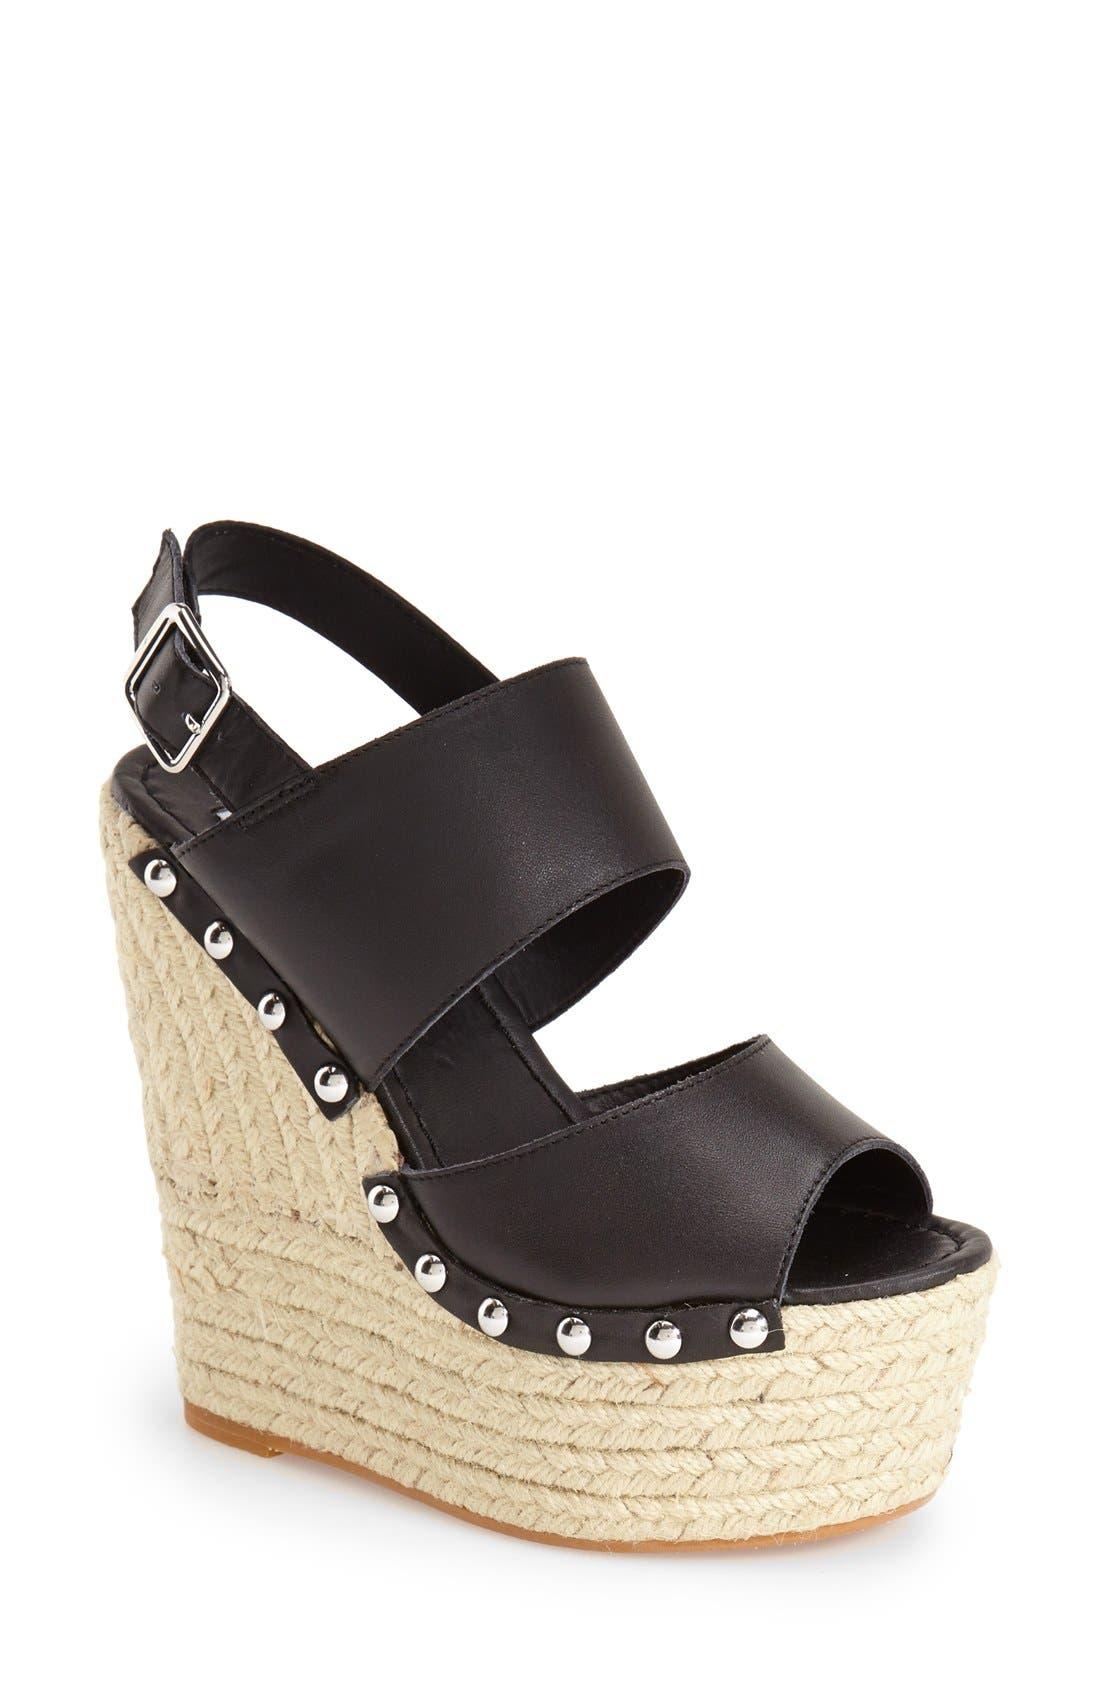 STEVE MADDEN 'Jummbo' Espadrille Wedge Sandal, Main, color, 001